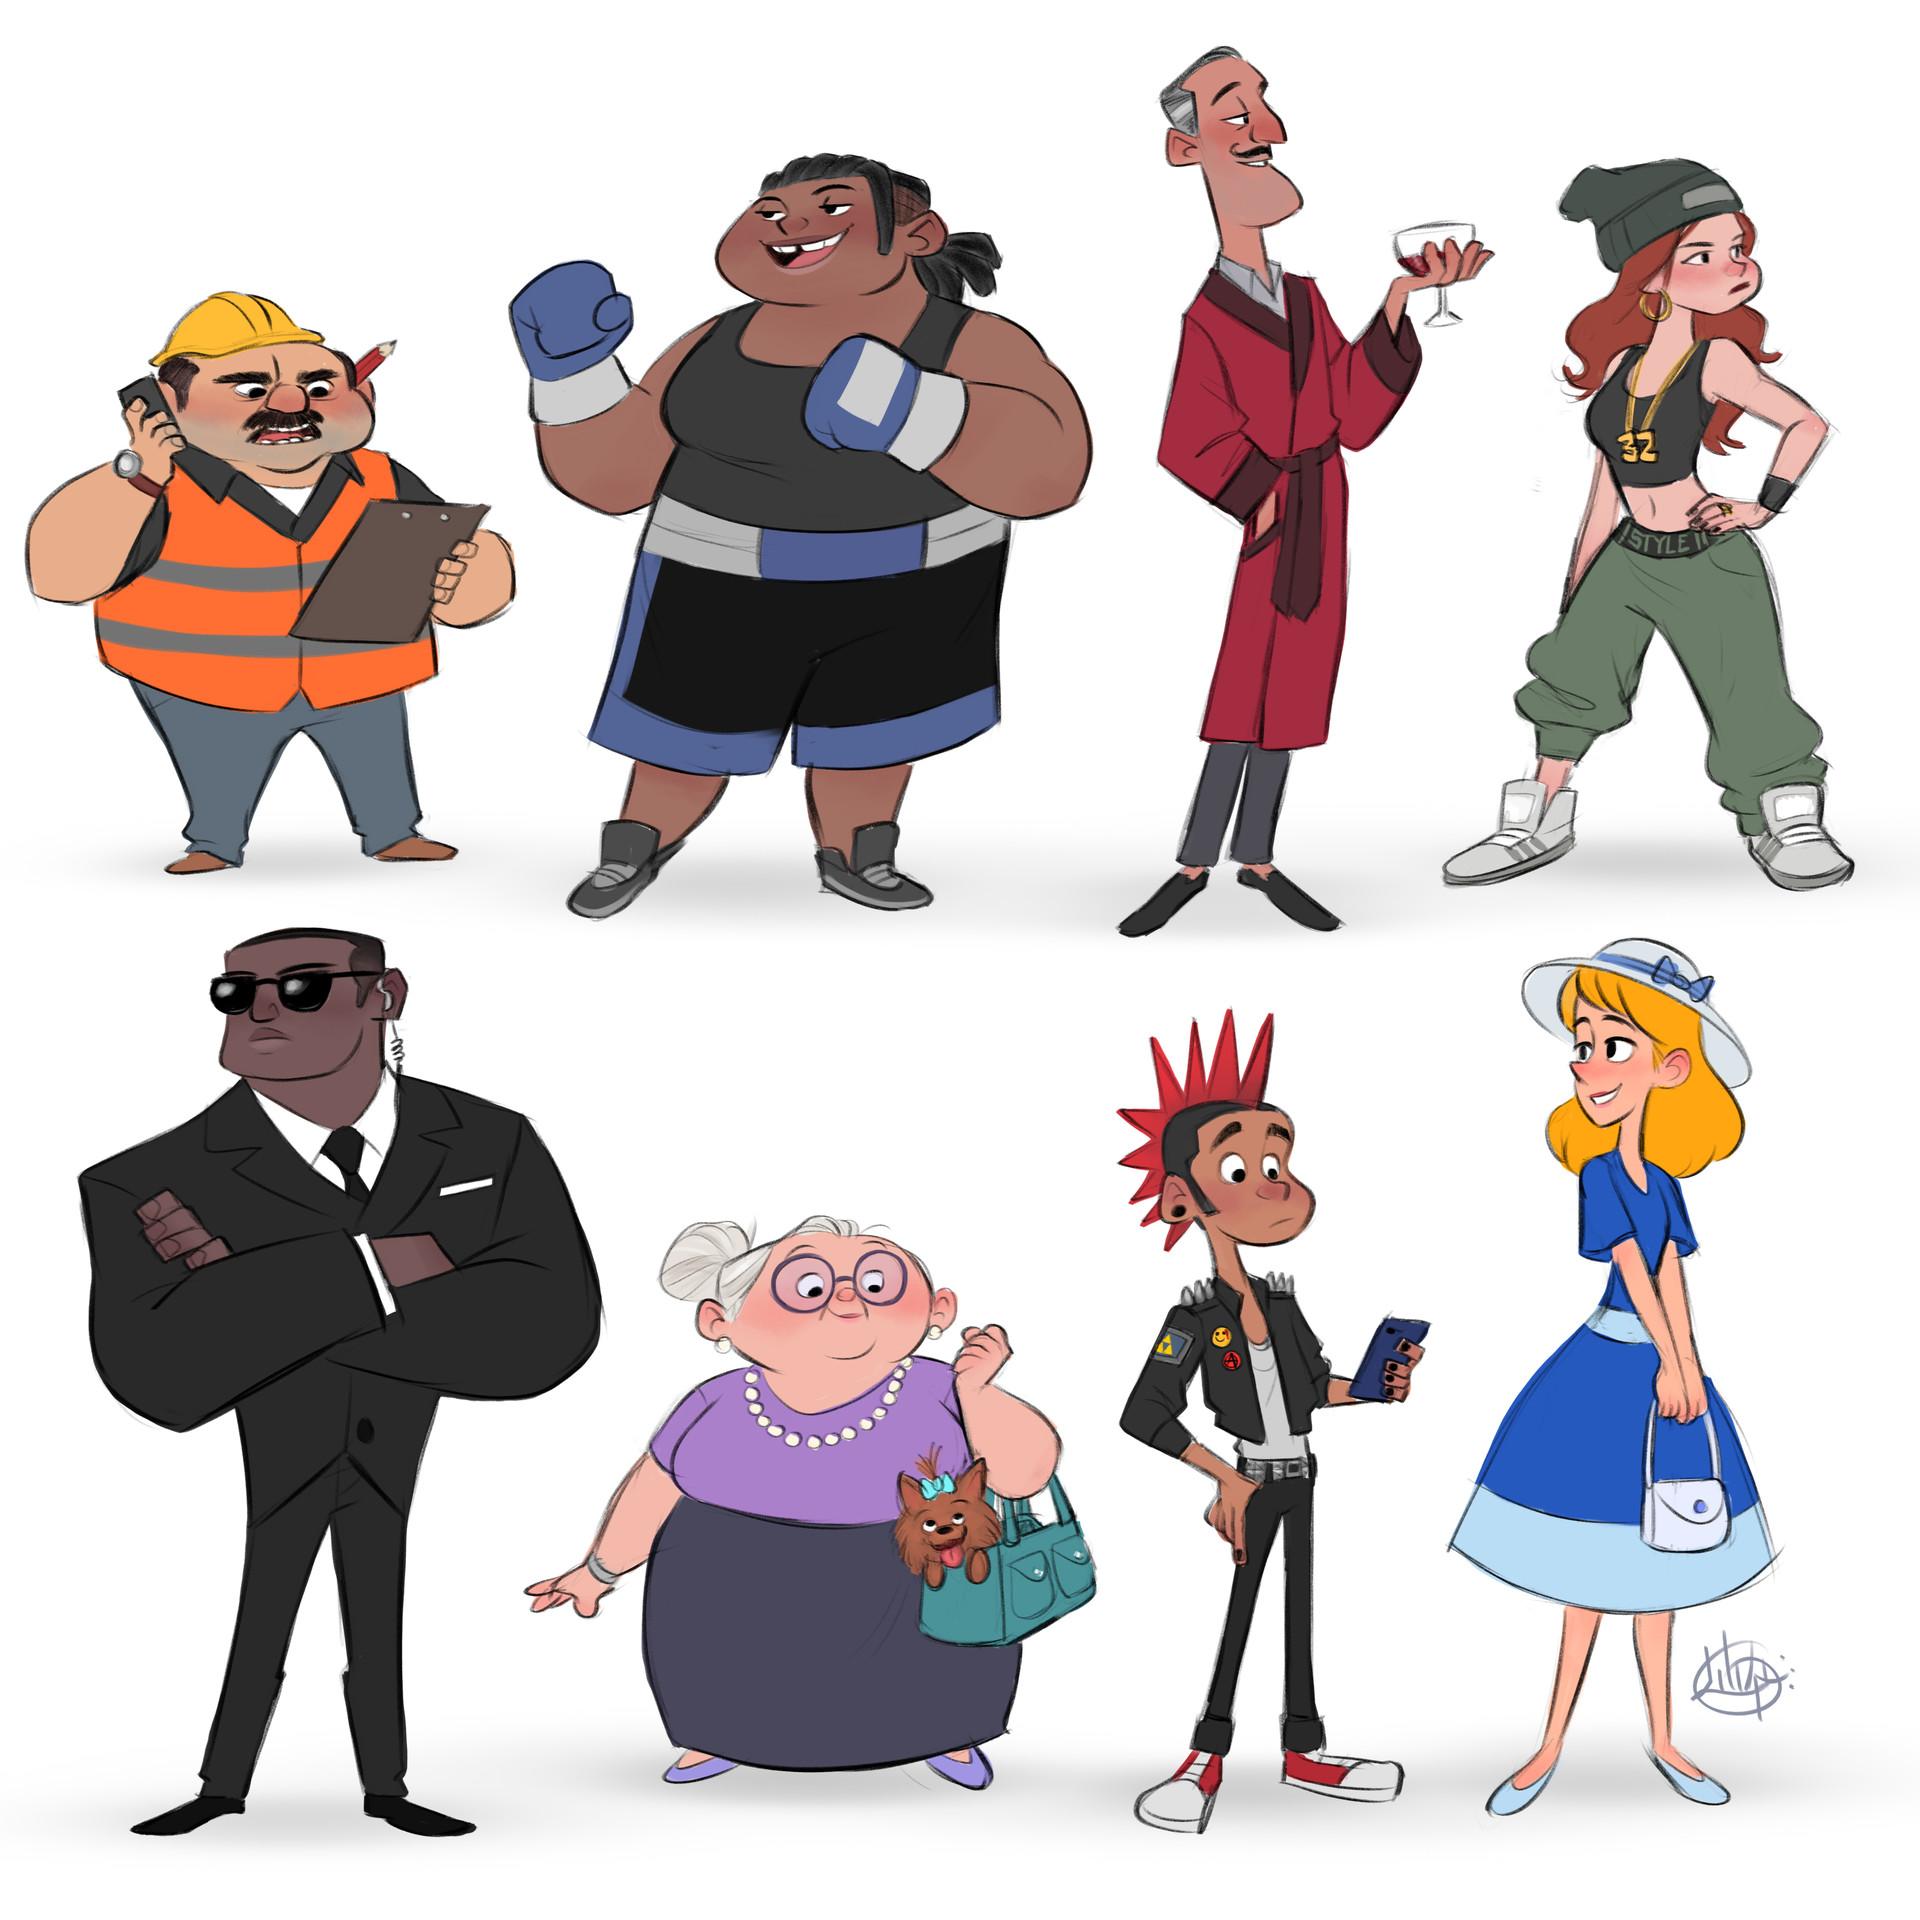 Luigi lucarelli random characters